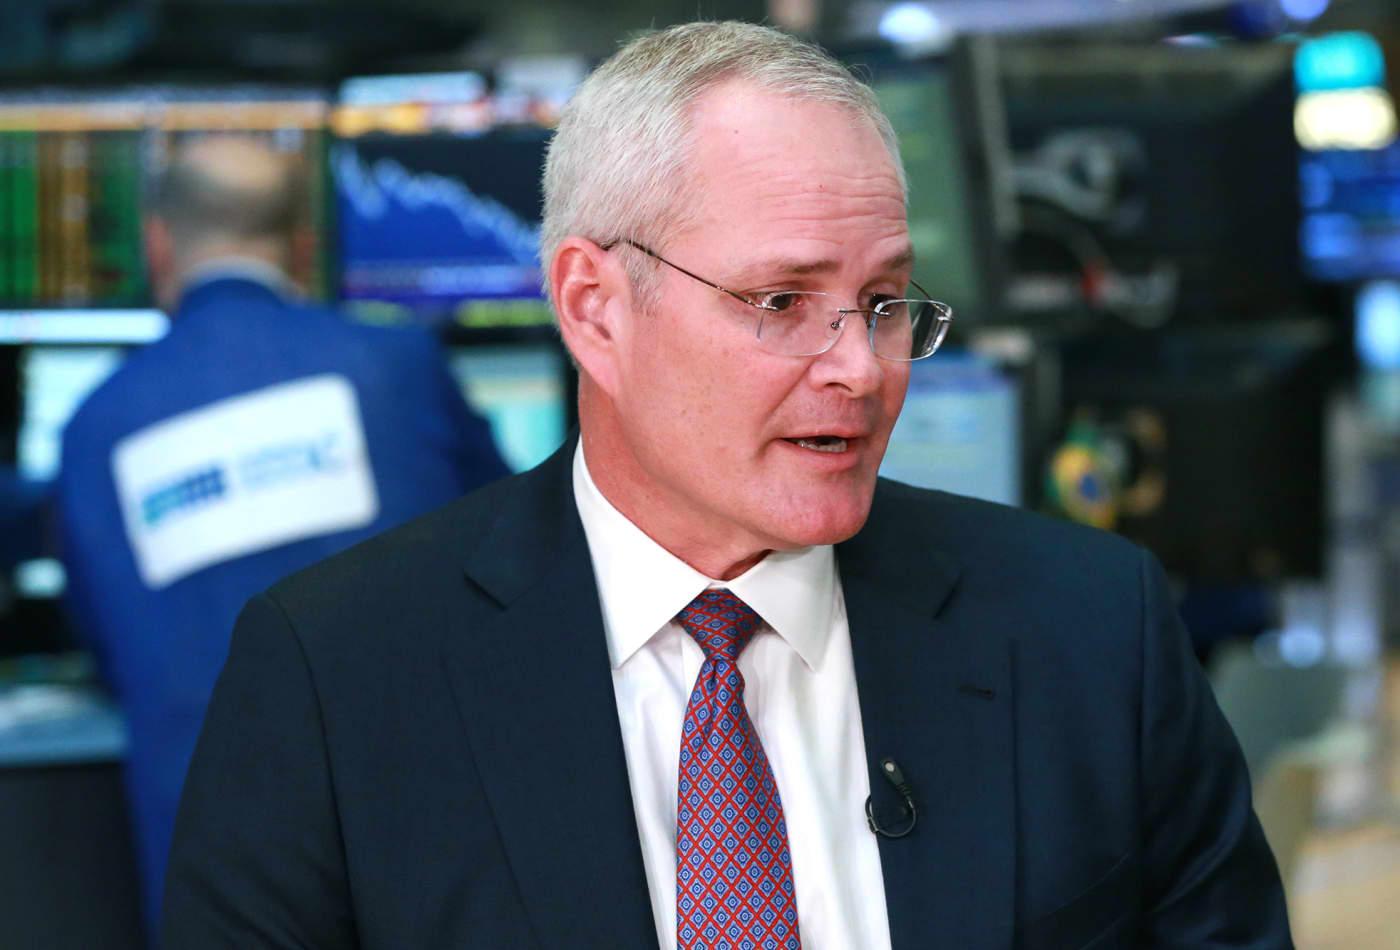 Exxon Mobil CEO Darren Woods on activist pressure